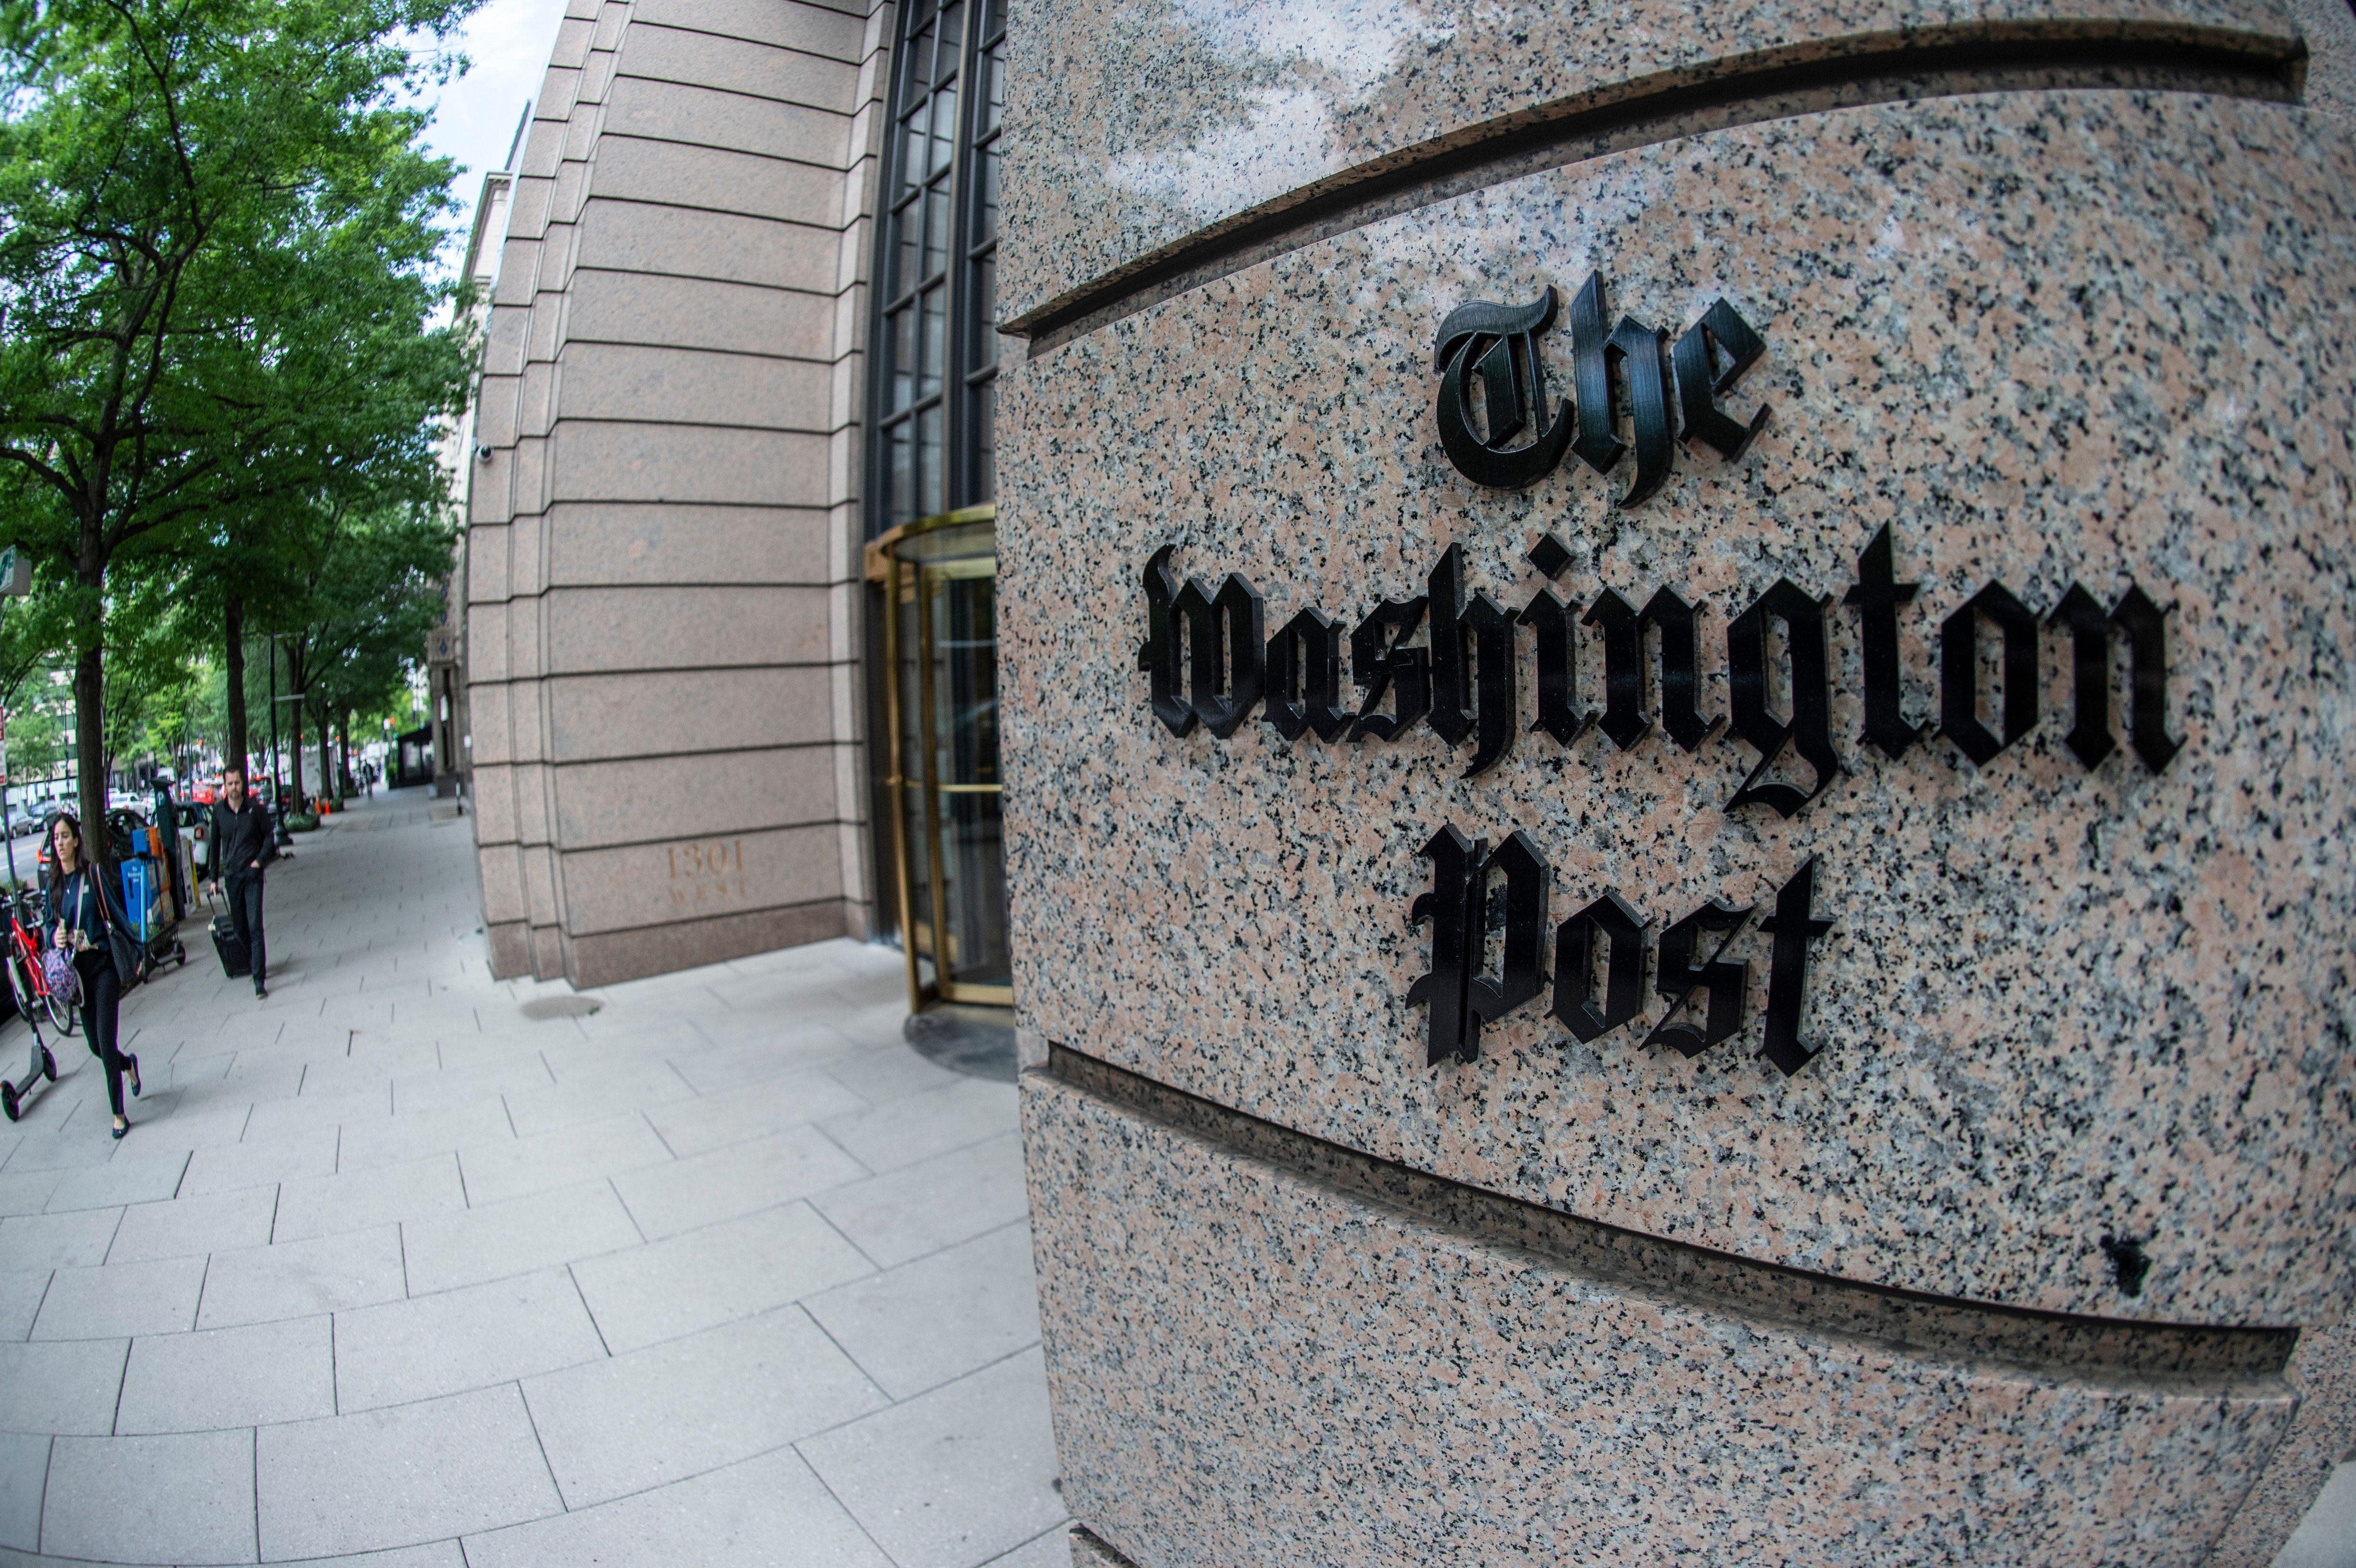 Washington Post reinstates reporter suspended over tweet